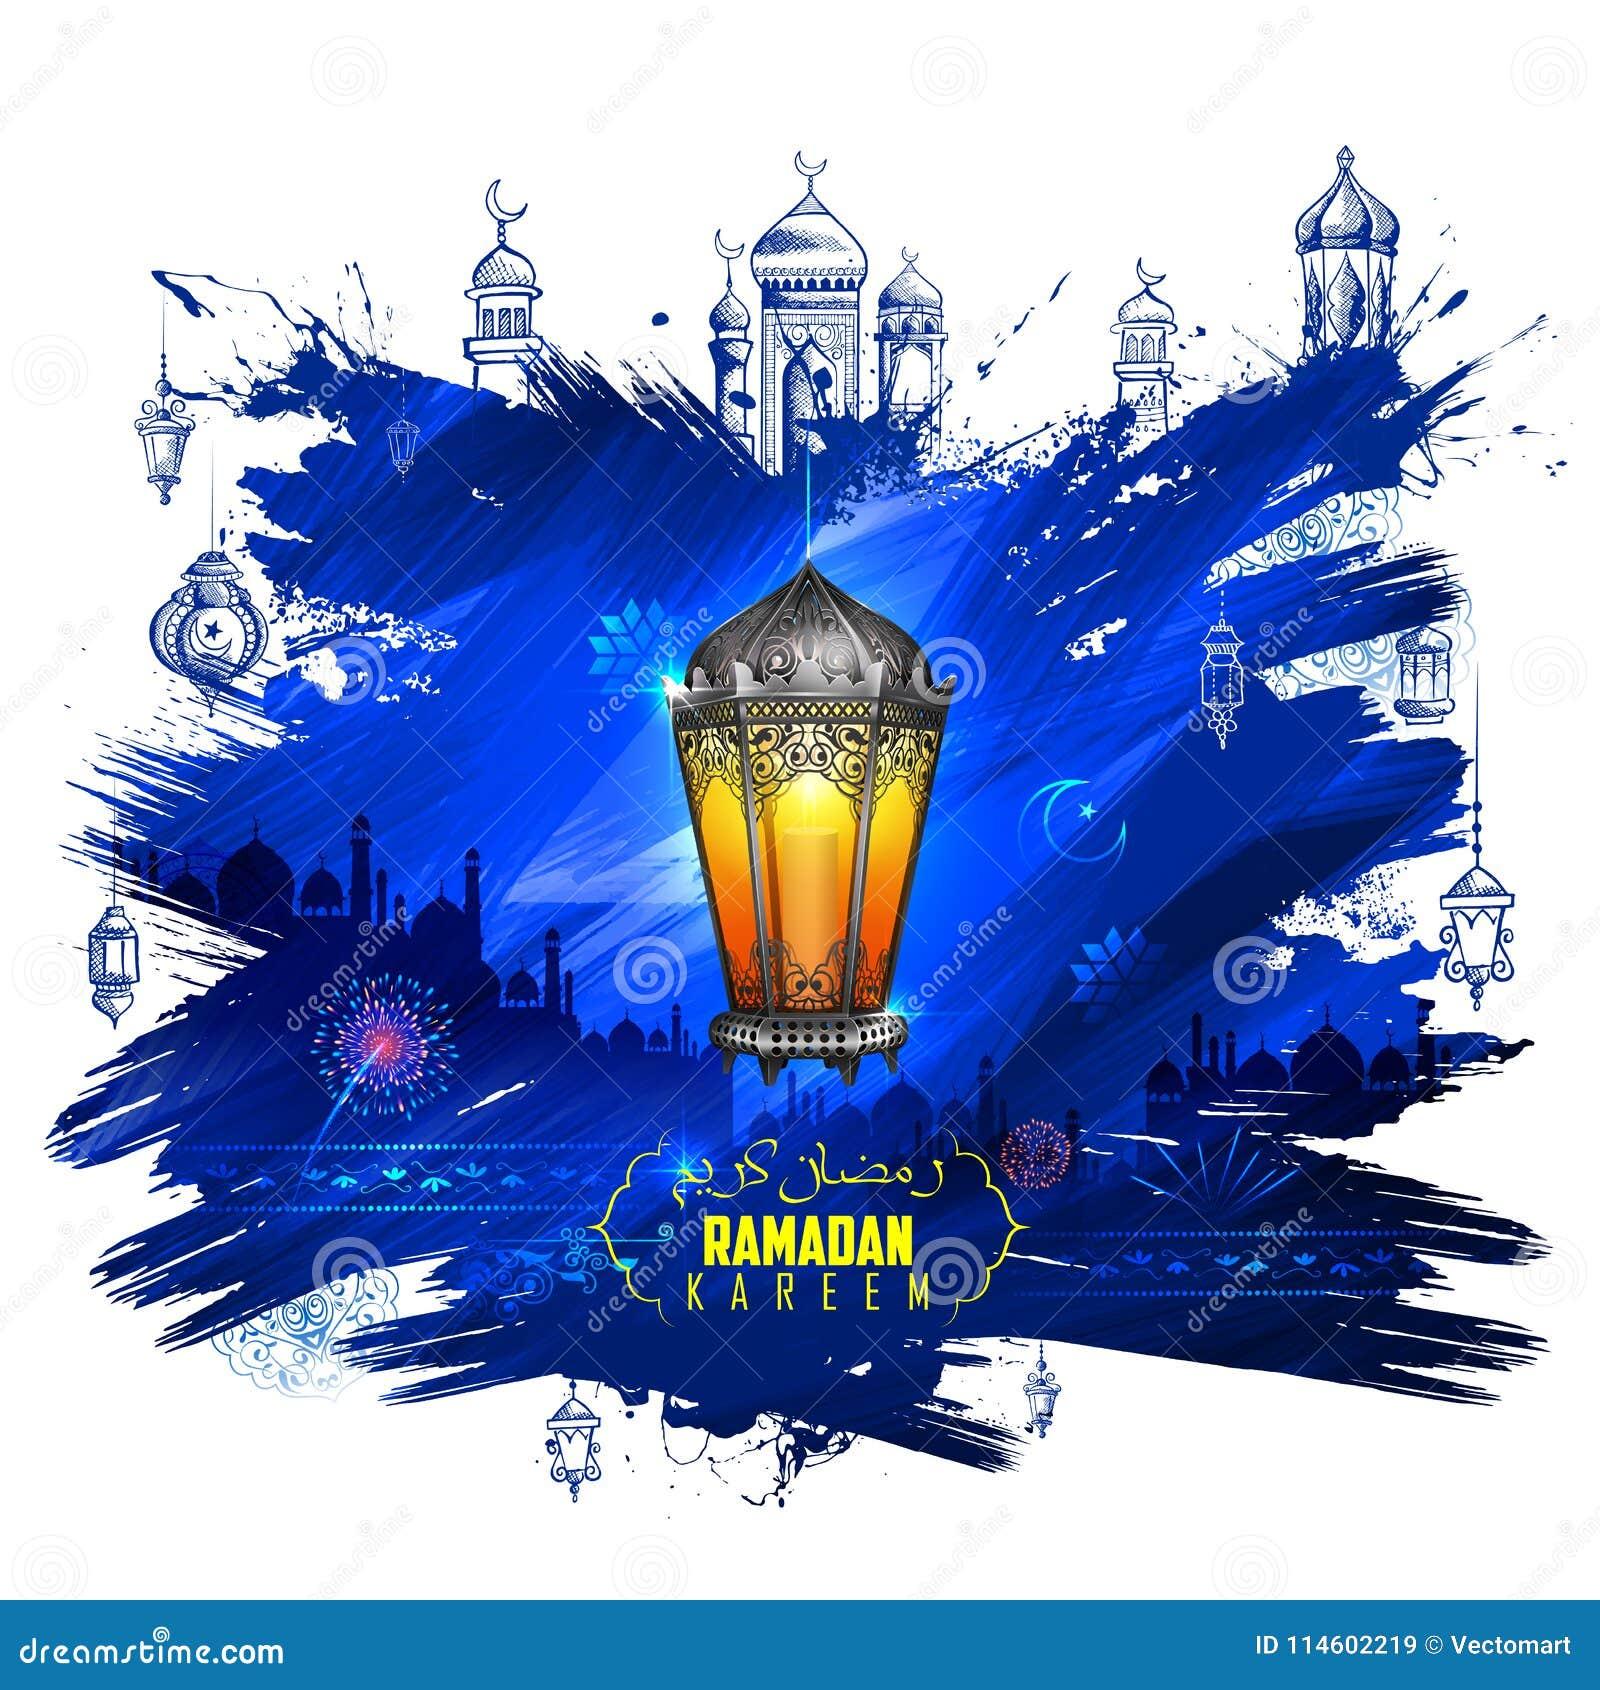 Ramadan kareem generous ramadan greetings for islam religious download ramadan kareem generous ramadan greetings for islam religious festival eid with freehand sketch mecca building m4hsunfo